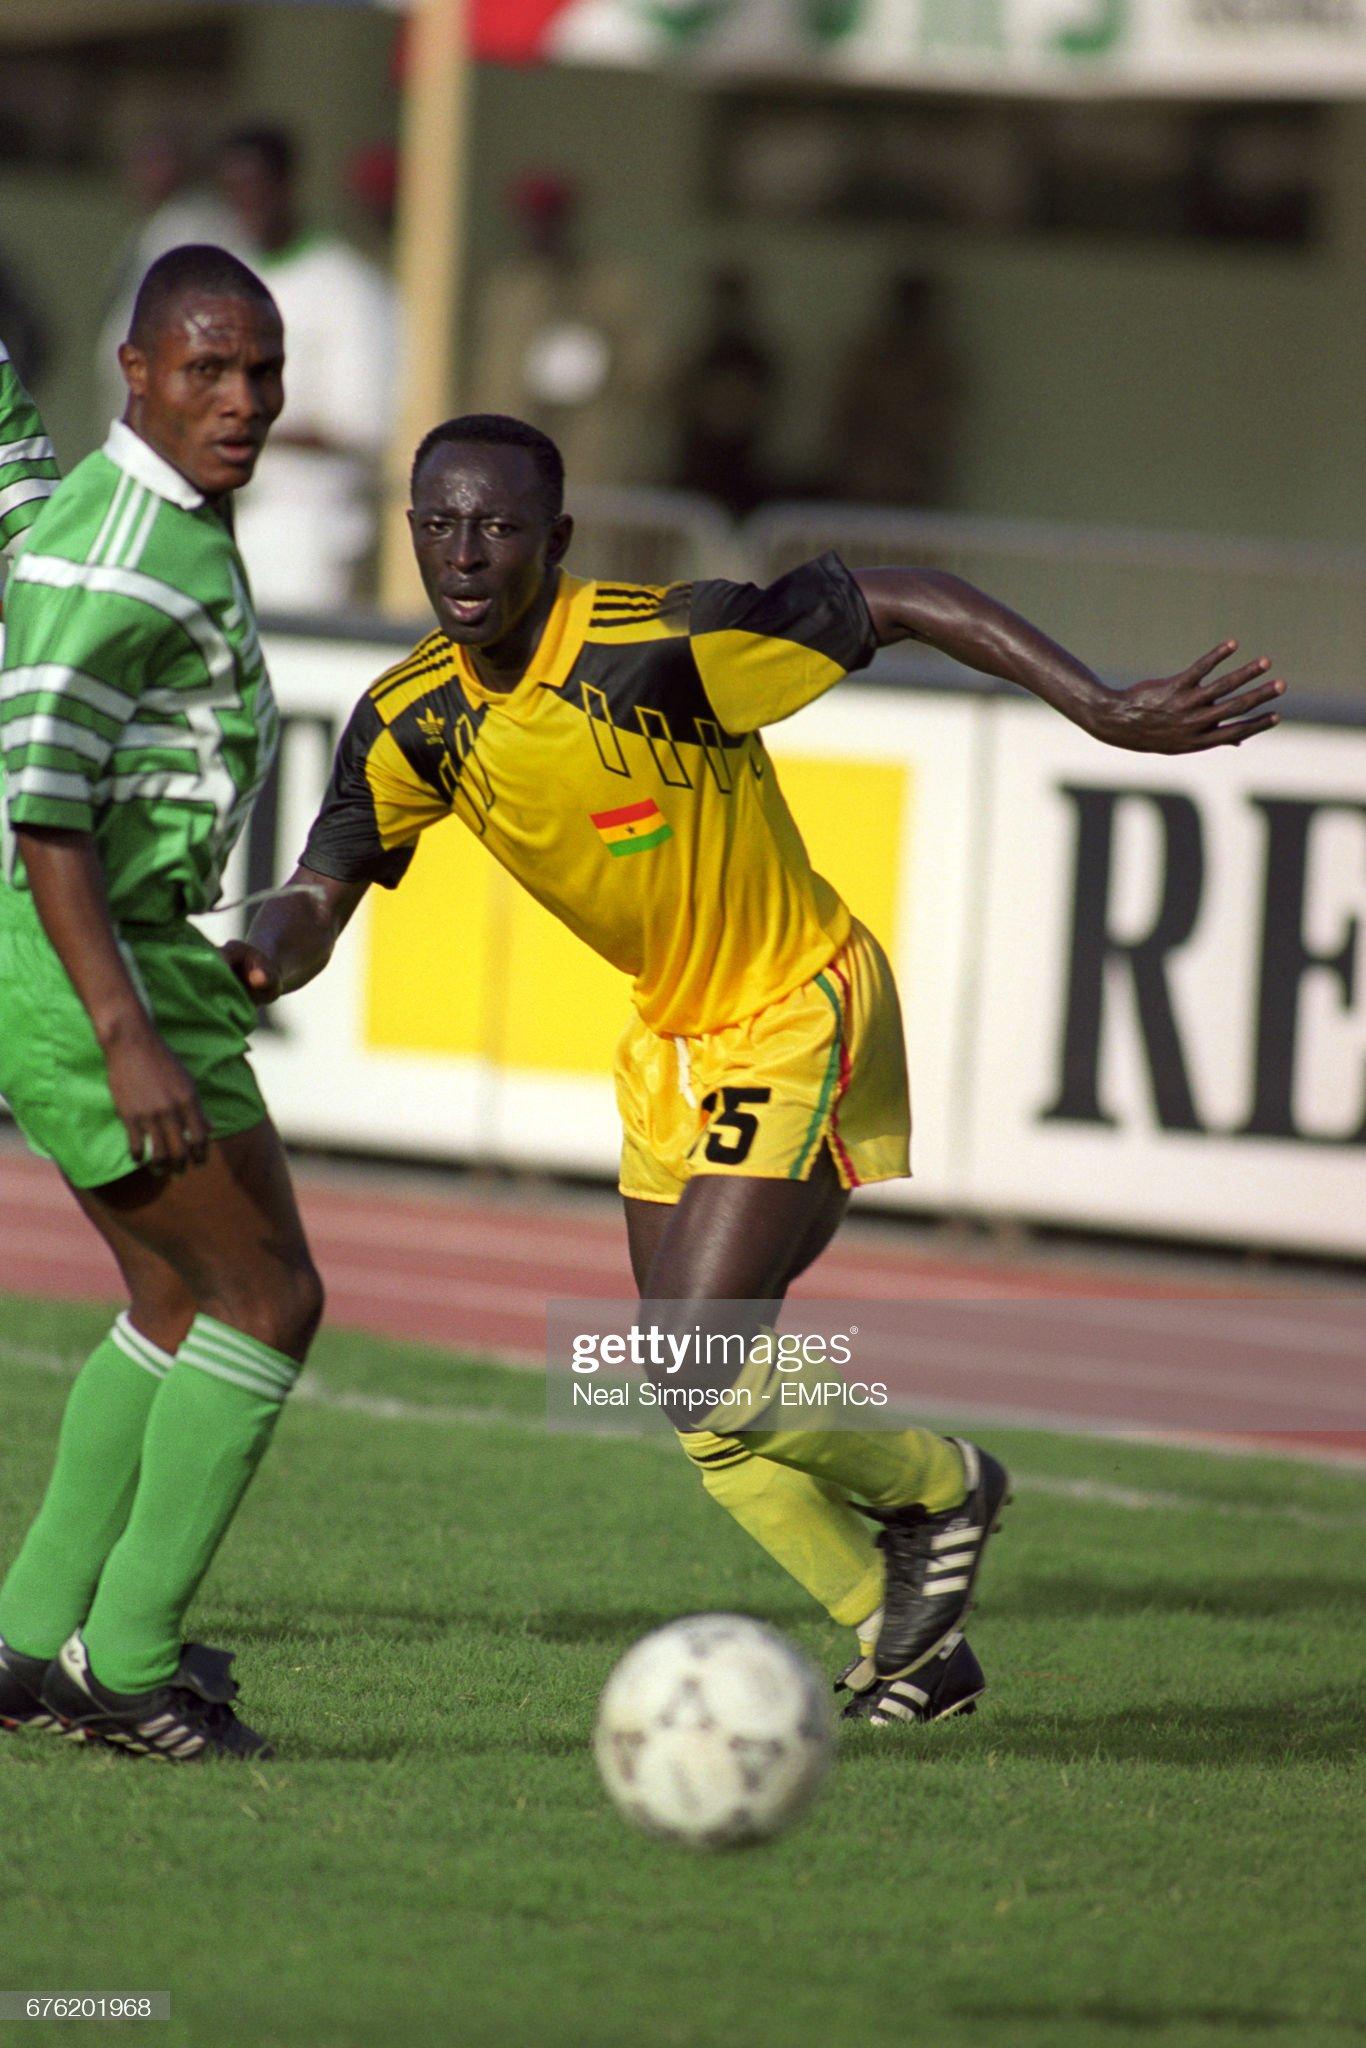 Soccer - African Nations Cup - Semi Final - Ghana v Nigeria - Dakar : News Photo